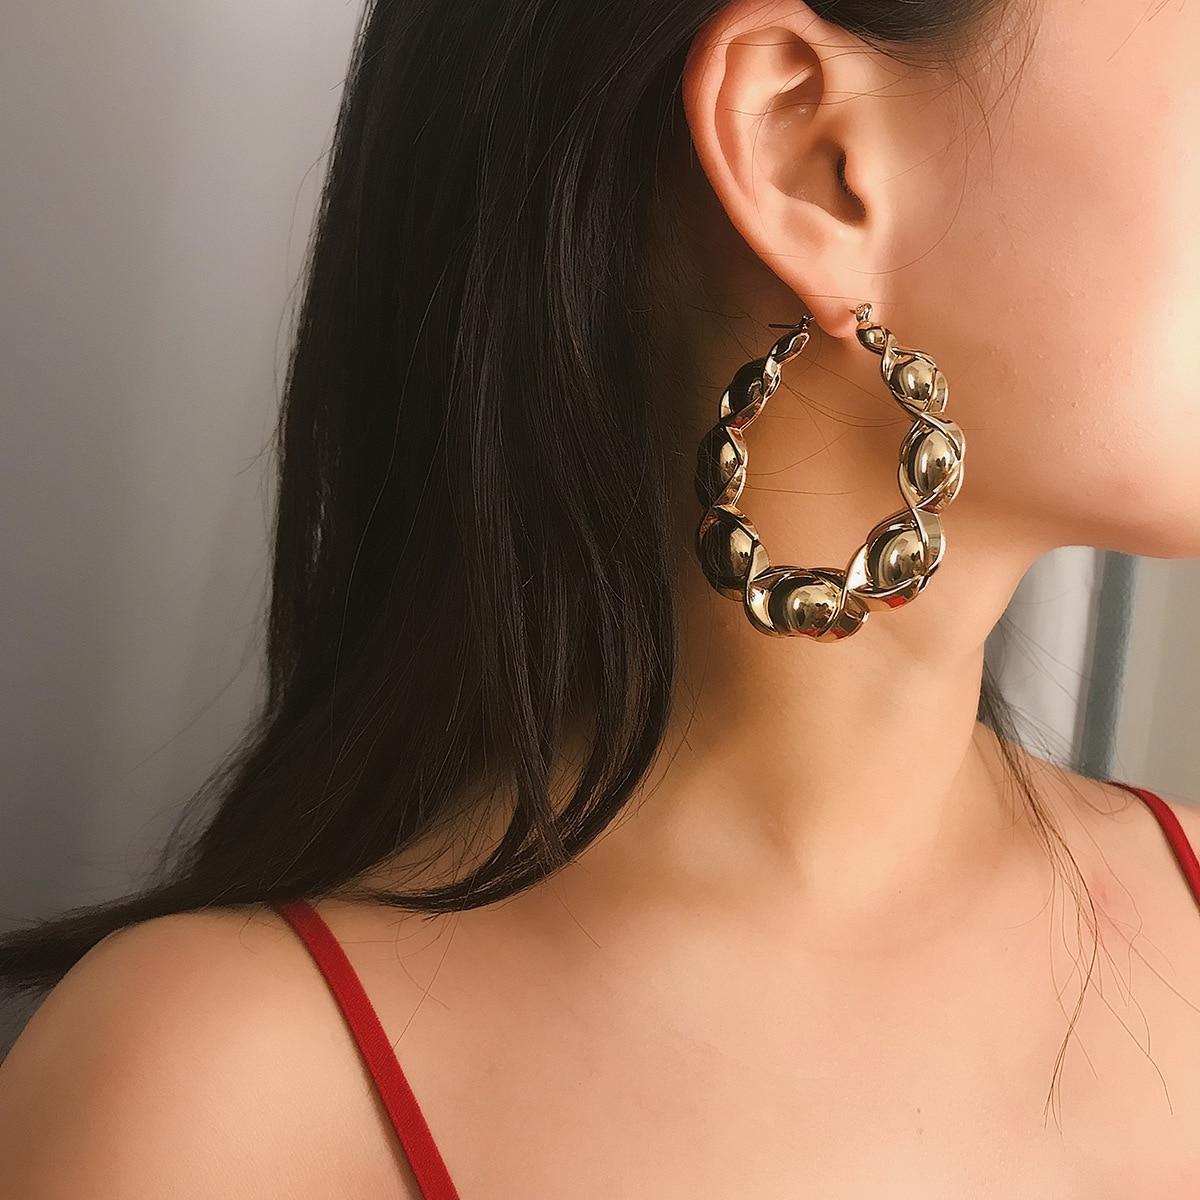 Luxury Punk Gold Color Big Hoop Earring For Women Irregular Geometric Bead Statement Brincos New Fashion Jewelry